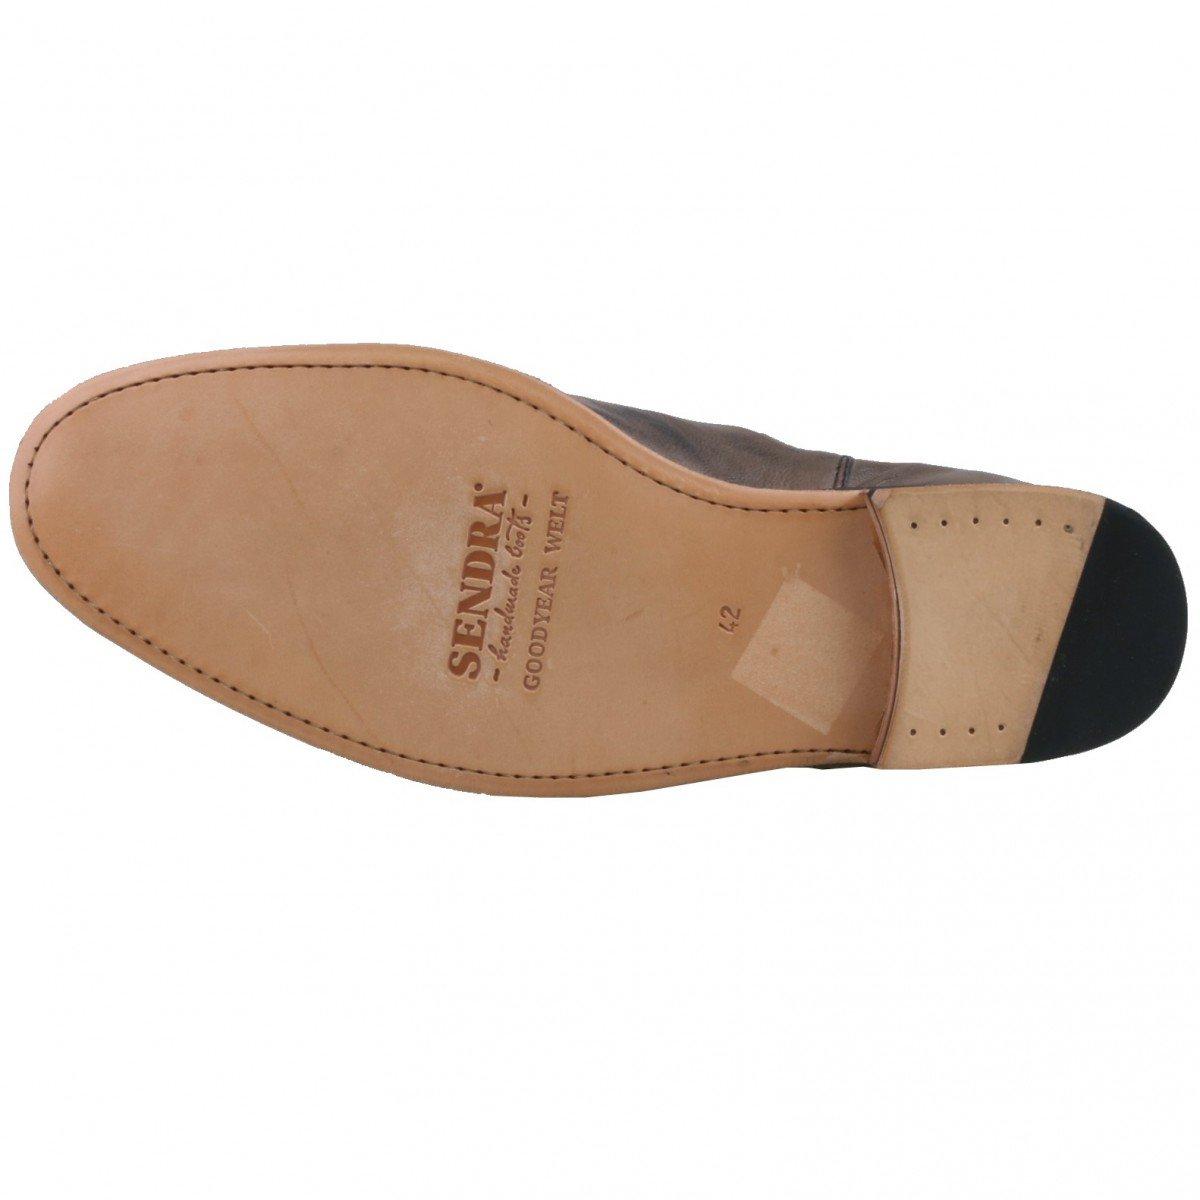 Sendra Sendra Sendra Herren Chelsea Stiefel 11329 Braun 9b2d63